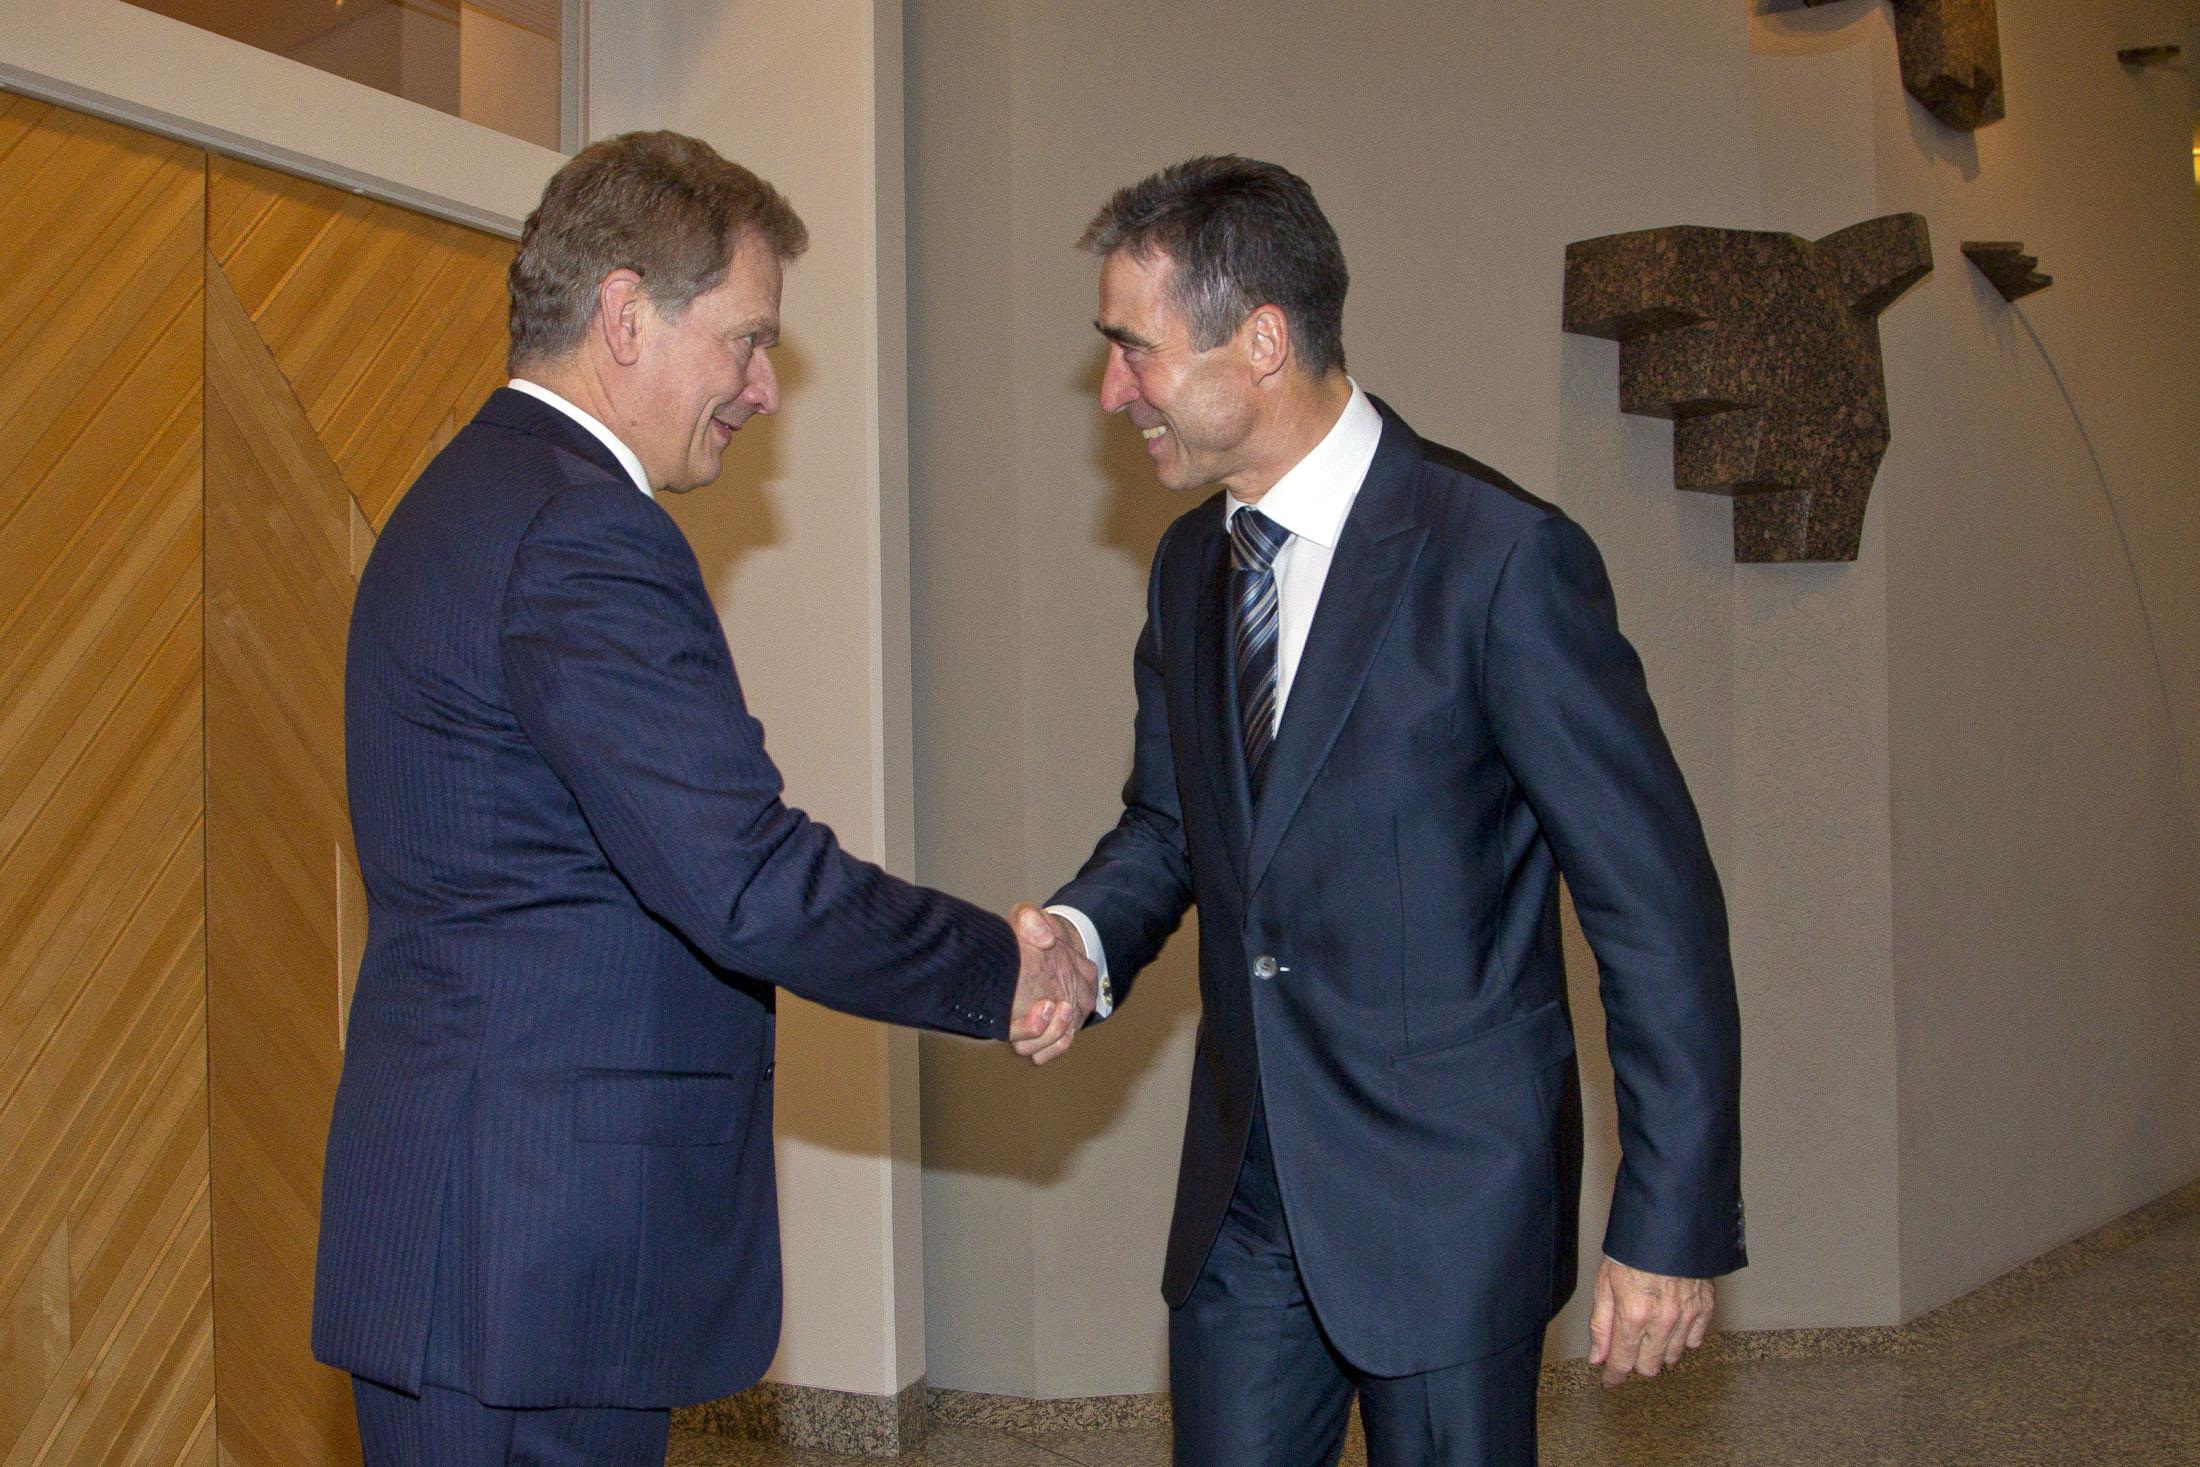 President of Finland Sauli Niinisto and NATO Secretary General Anders Fogh Rasmussen, Nov. 14, 2012